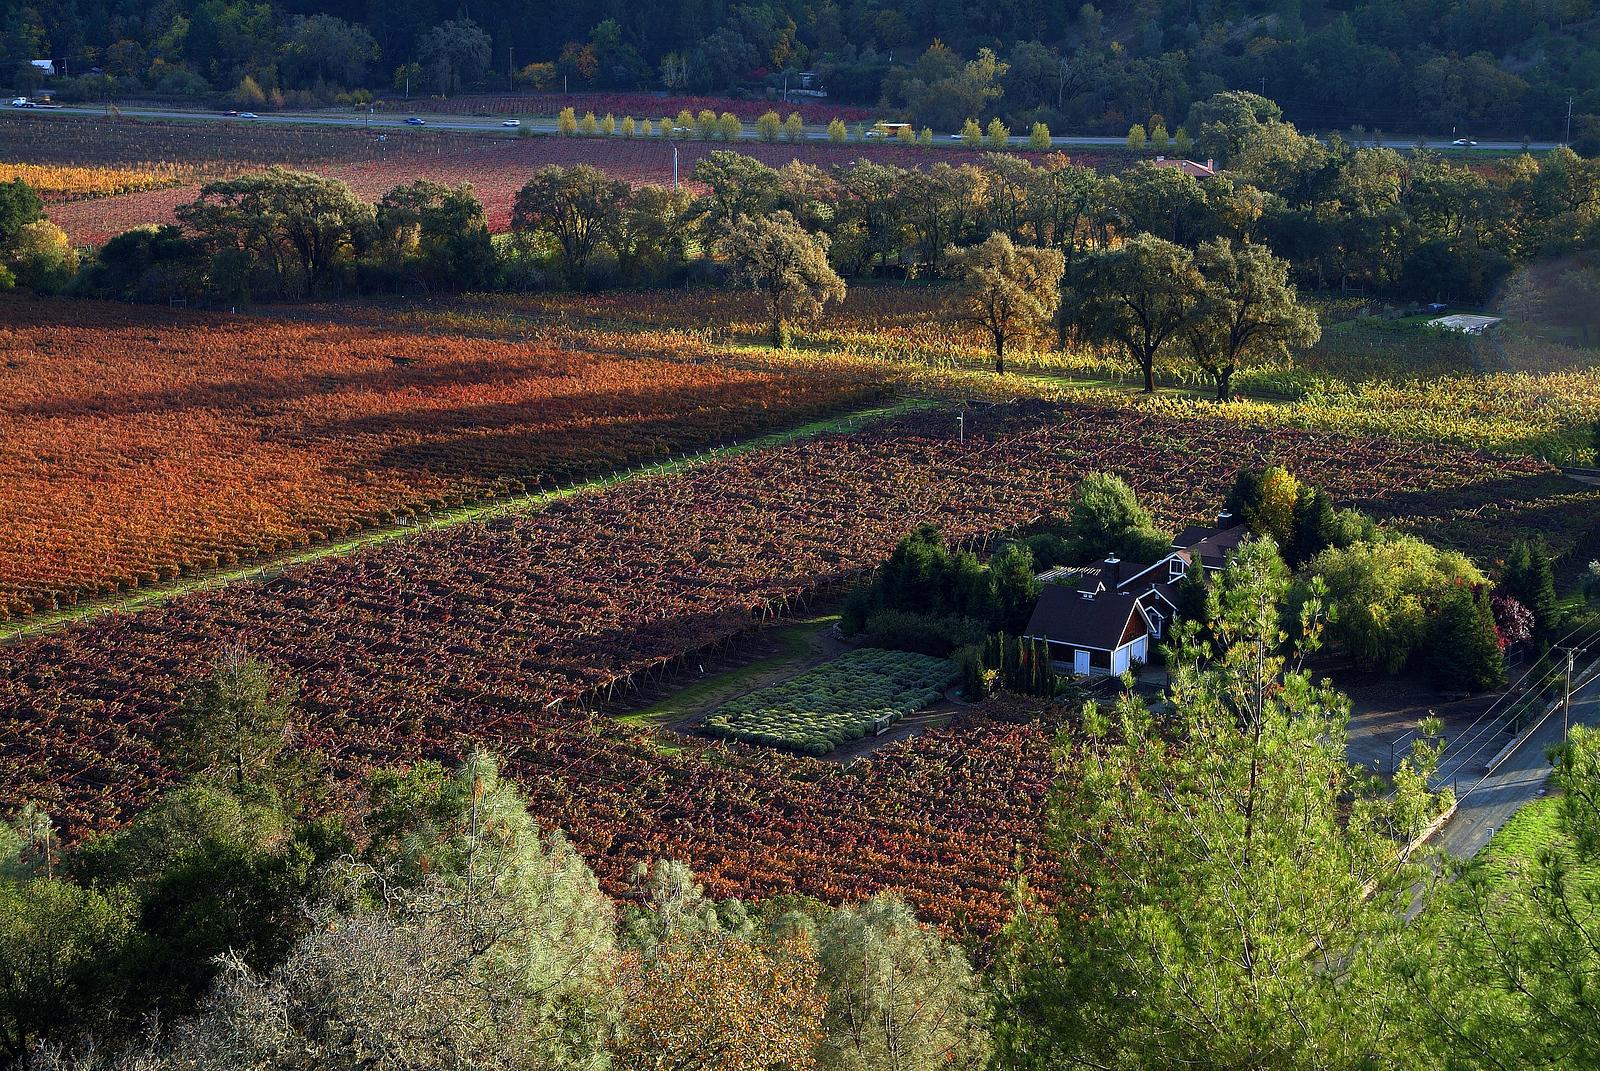 Aerial View of Vineyards Napa Valley, California